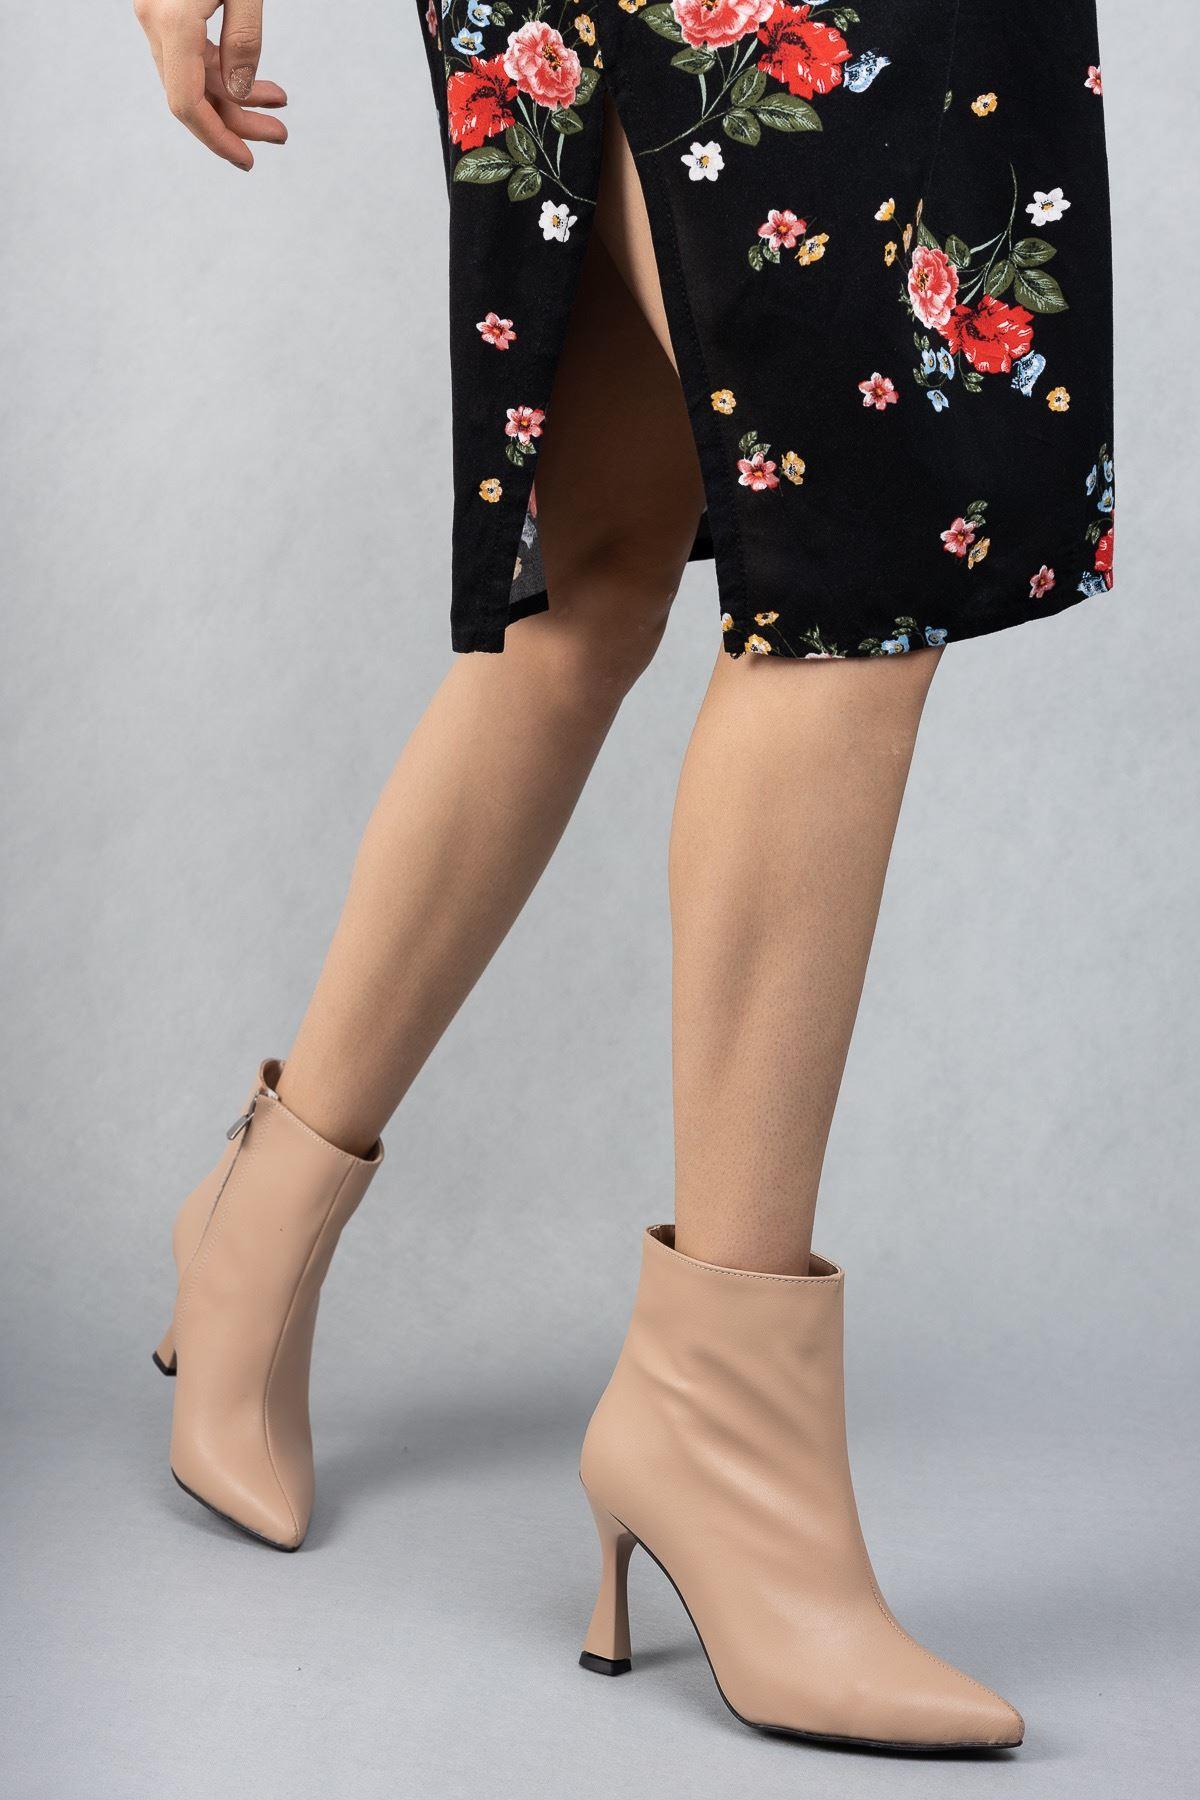 Kadın Beti Yüksek Topuklu Ten Mat Deri Bot